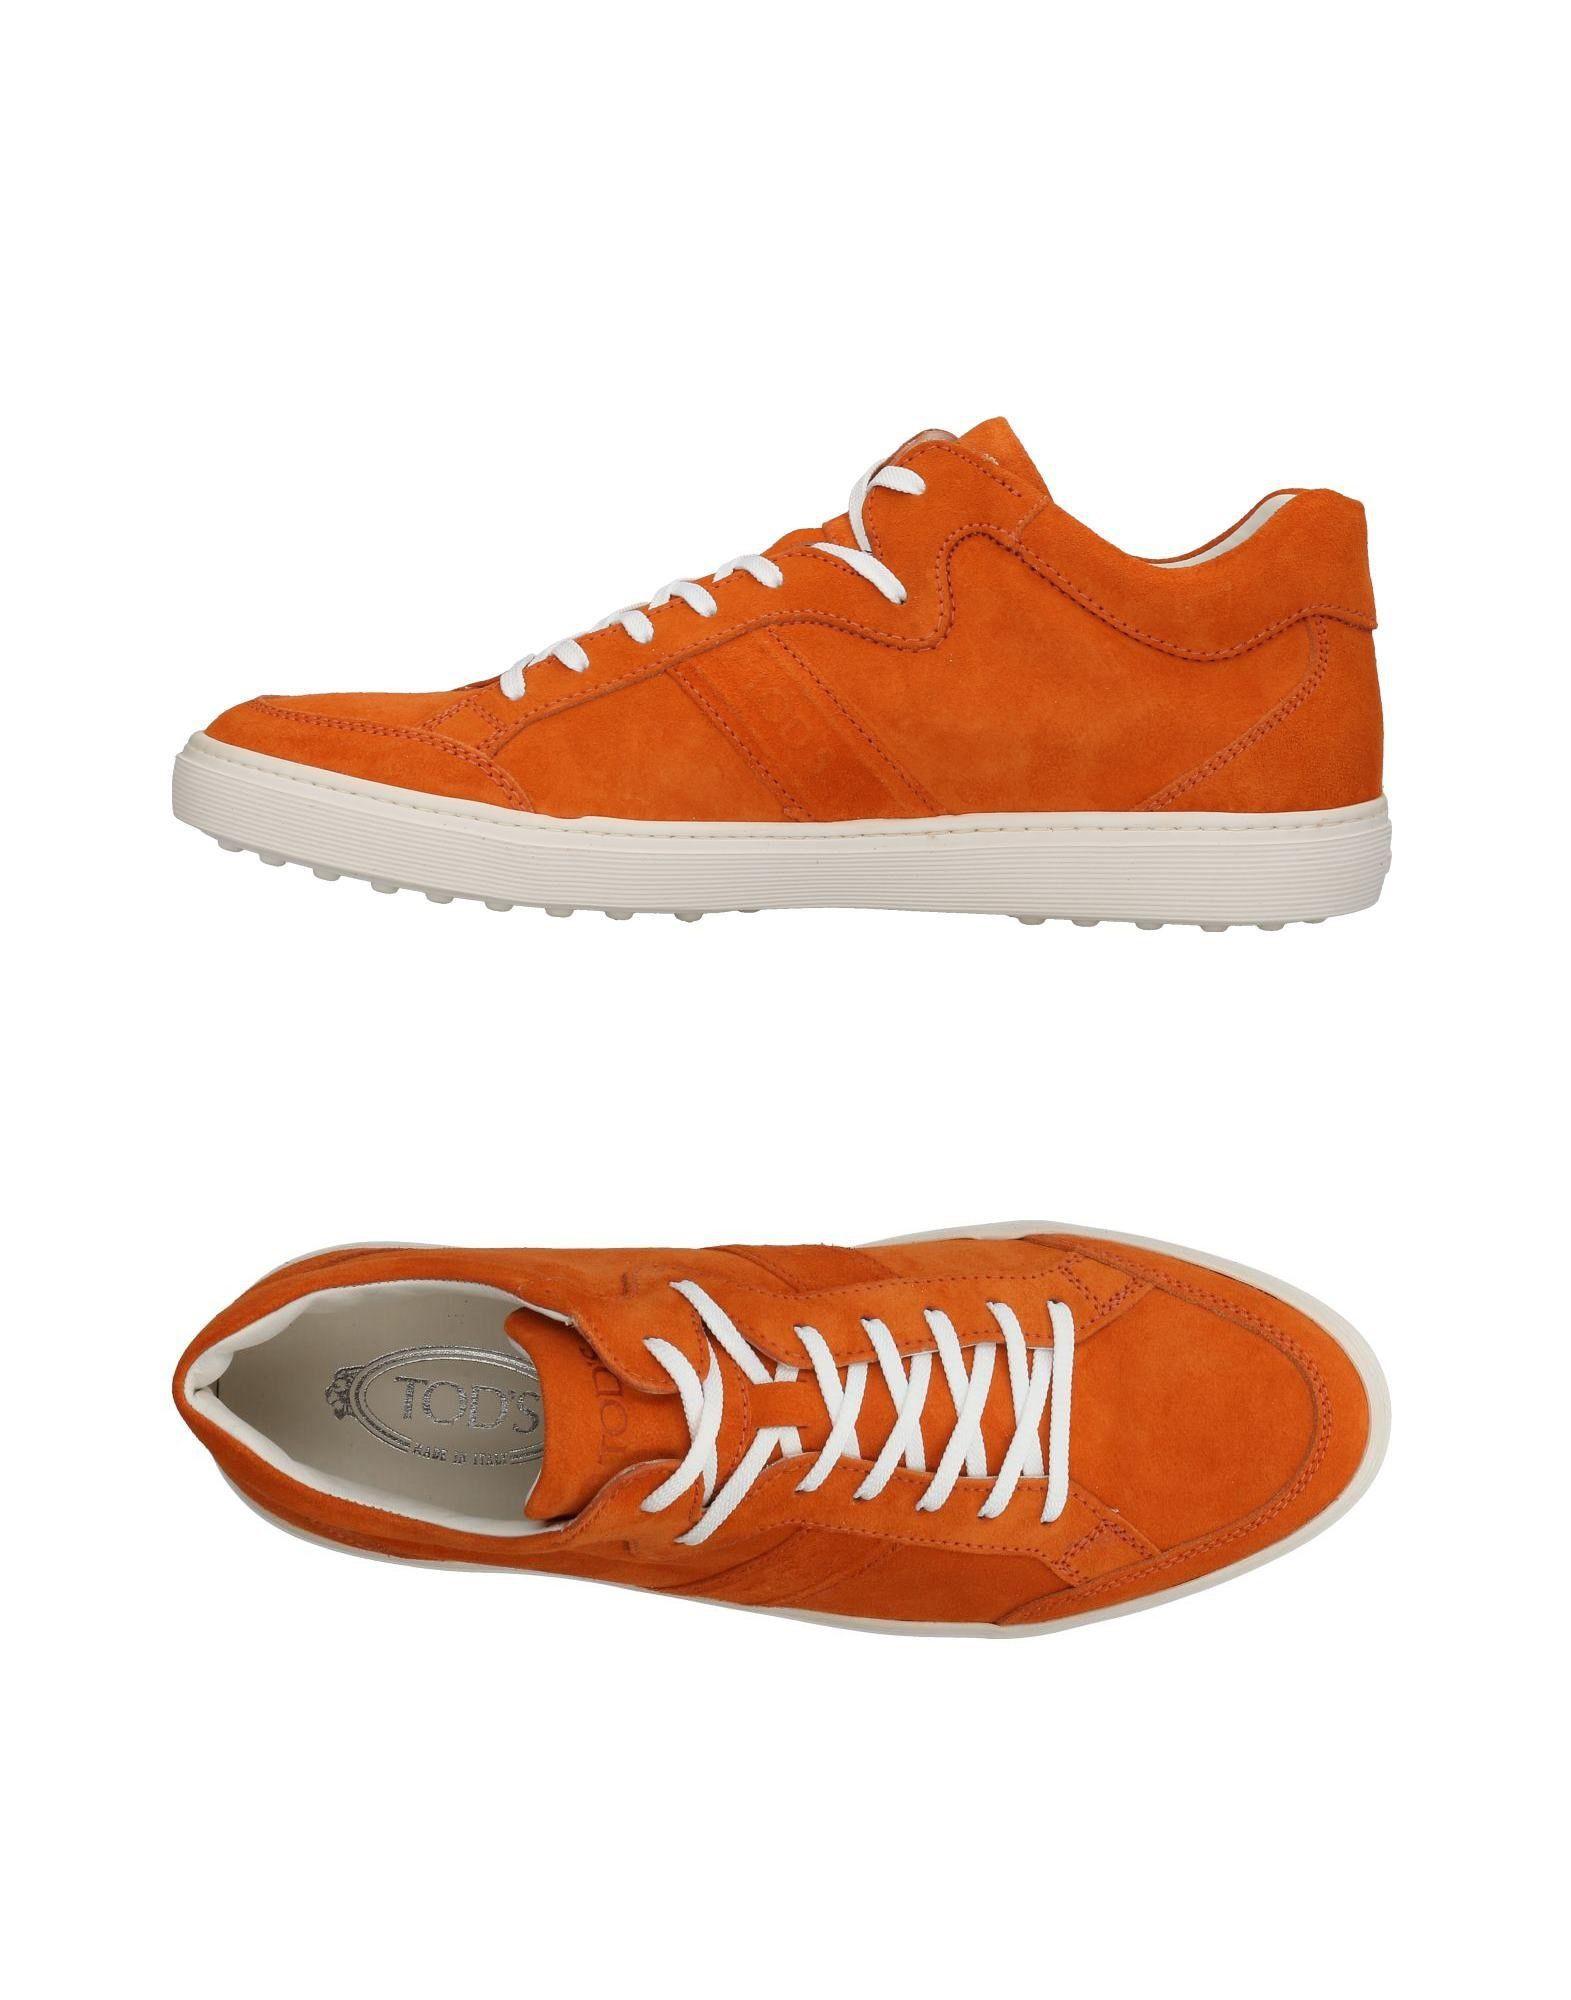 Tod's Sneakers Herren  11415051FM Gute Qualität beliebte Schuhe